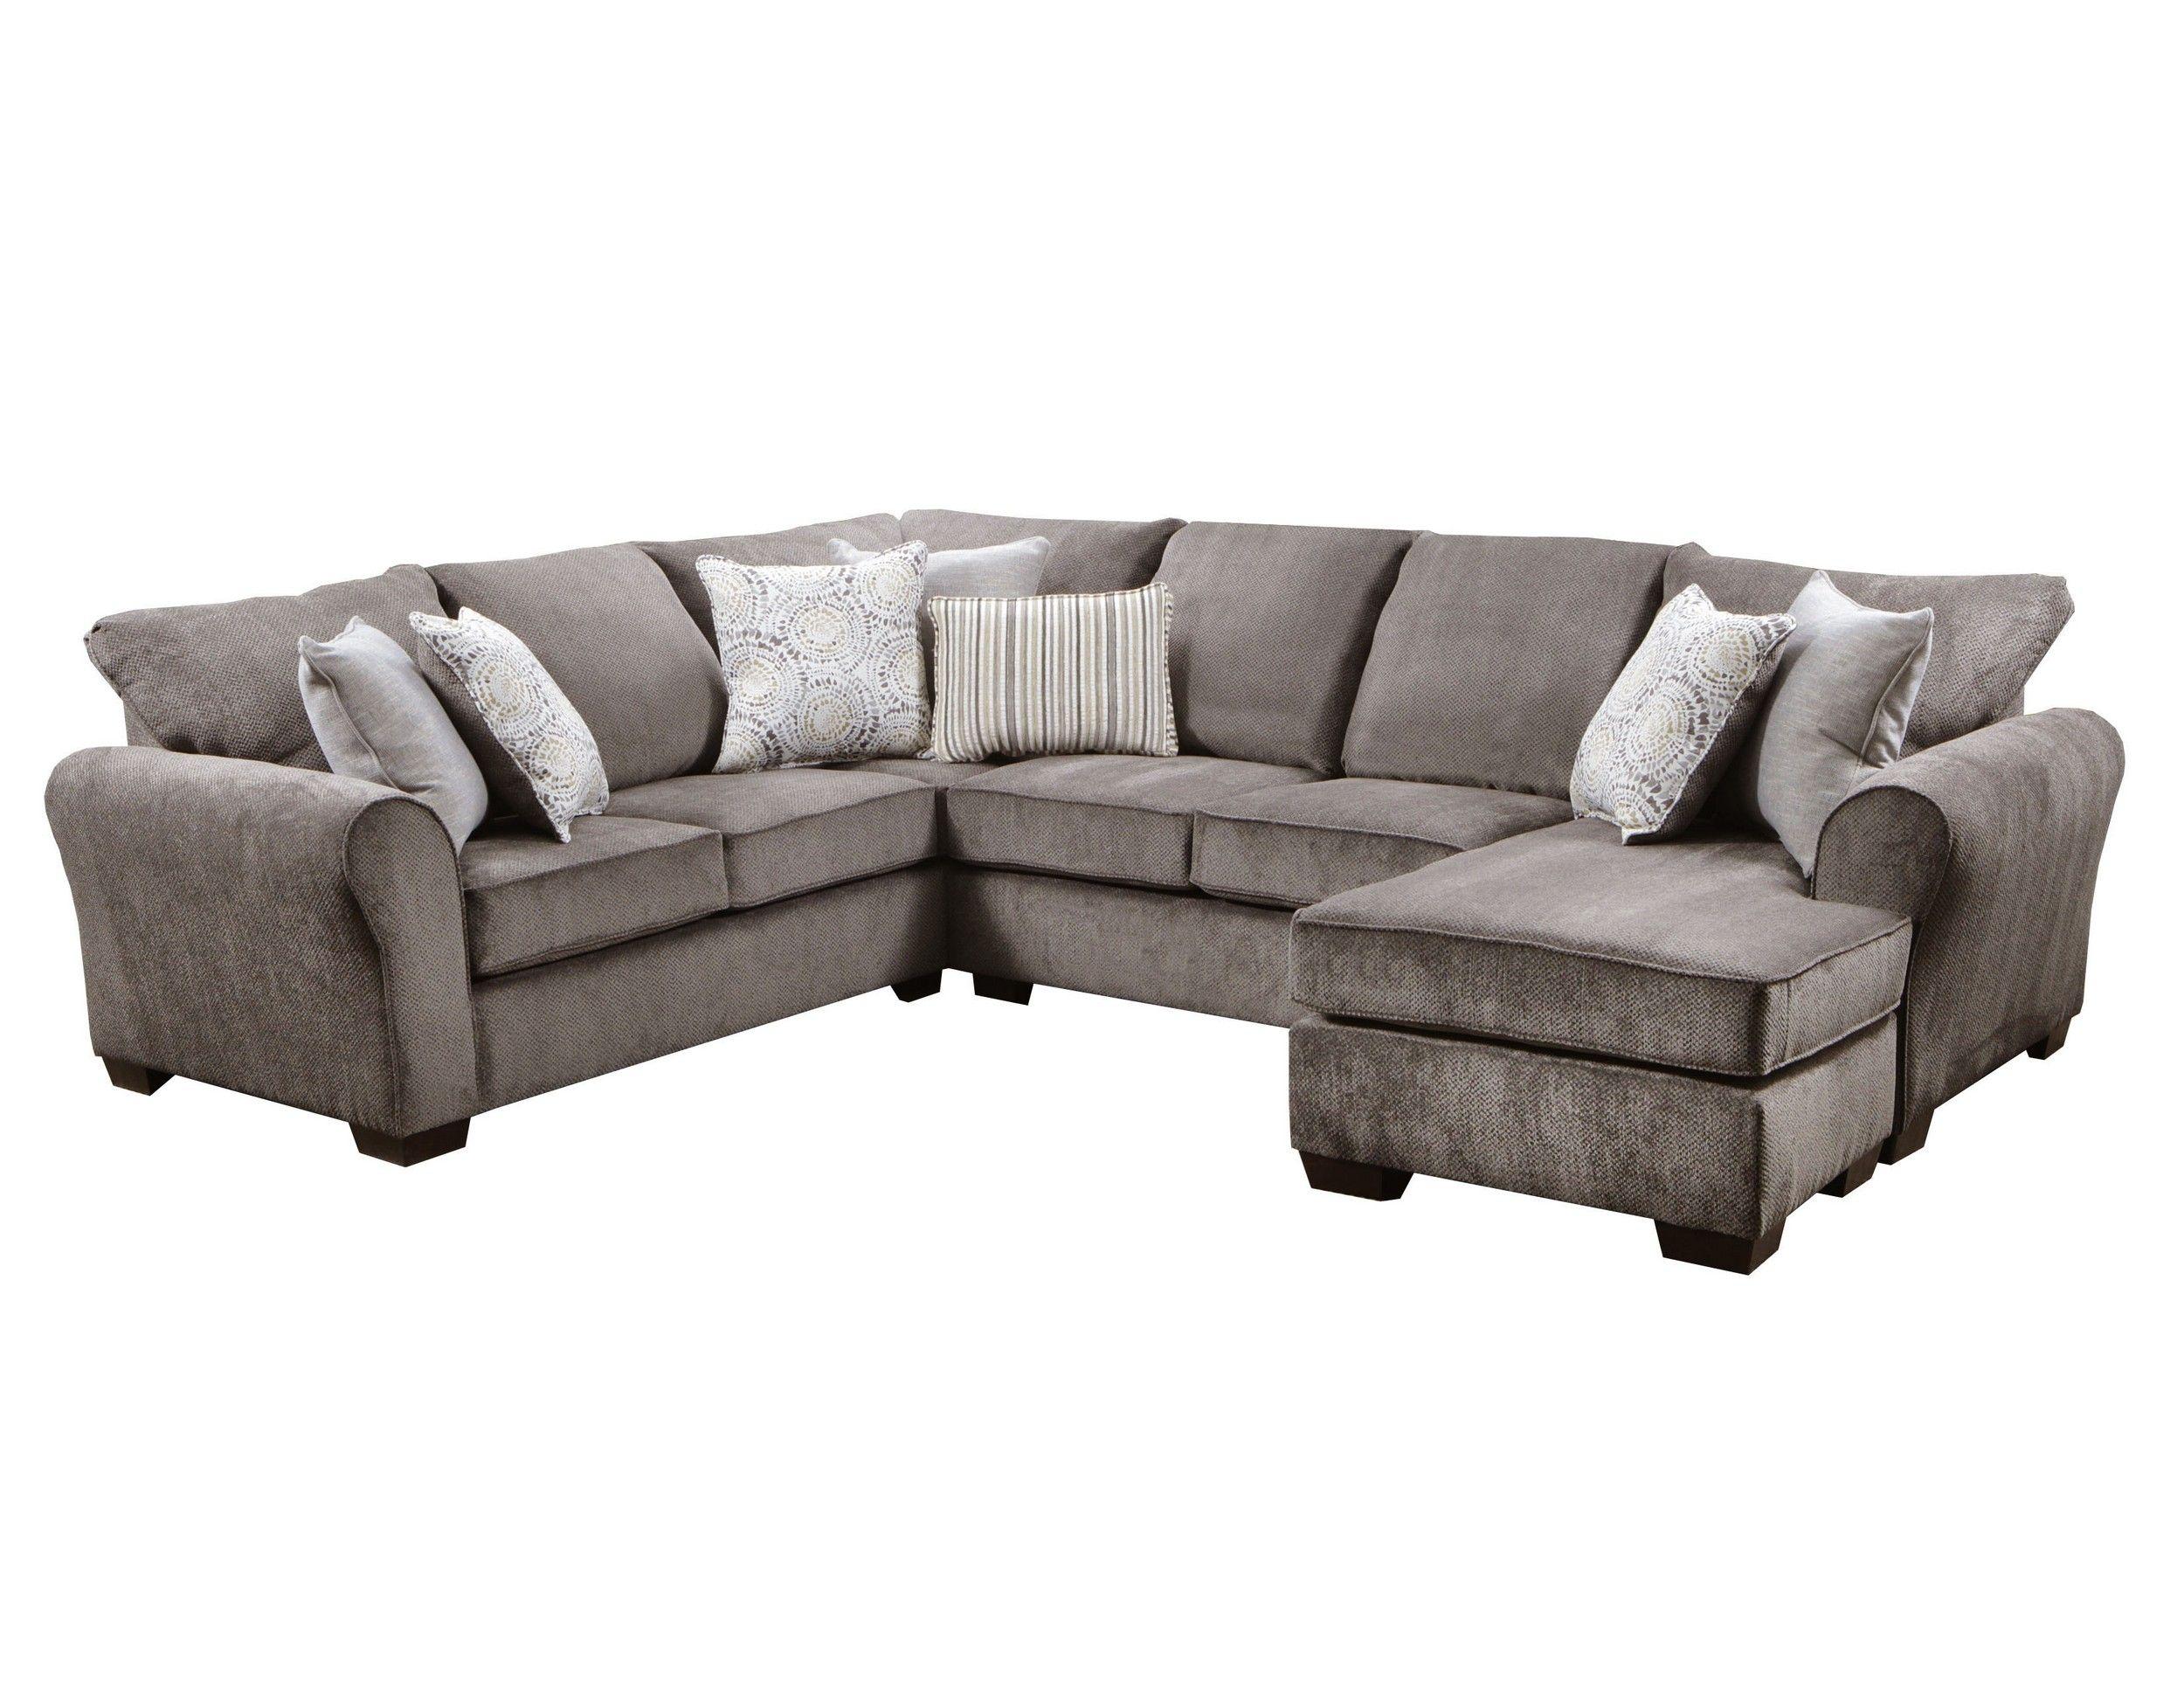 Simmons Upholstery Harlow Ash 2 Piece Sleeper Sectional Sofa